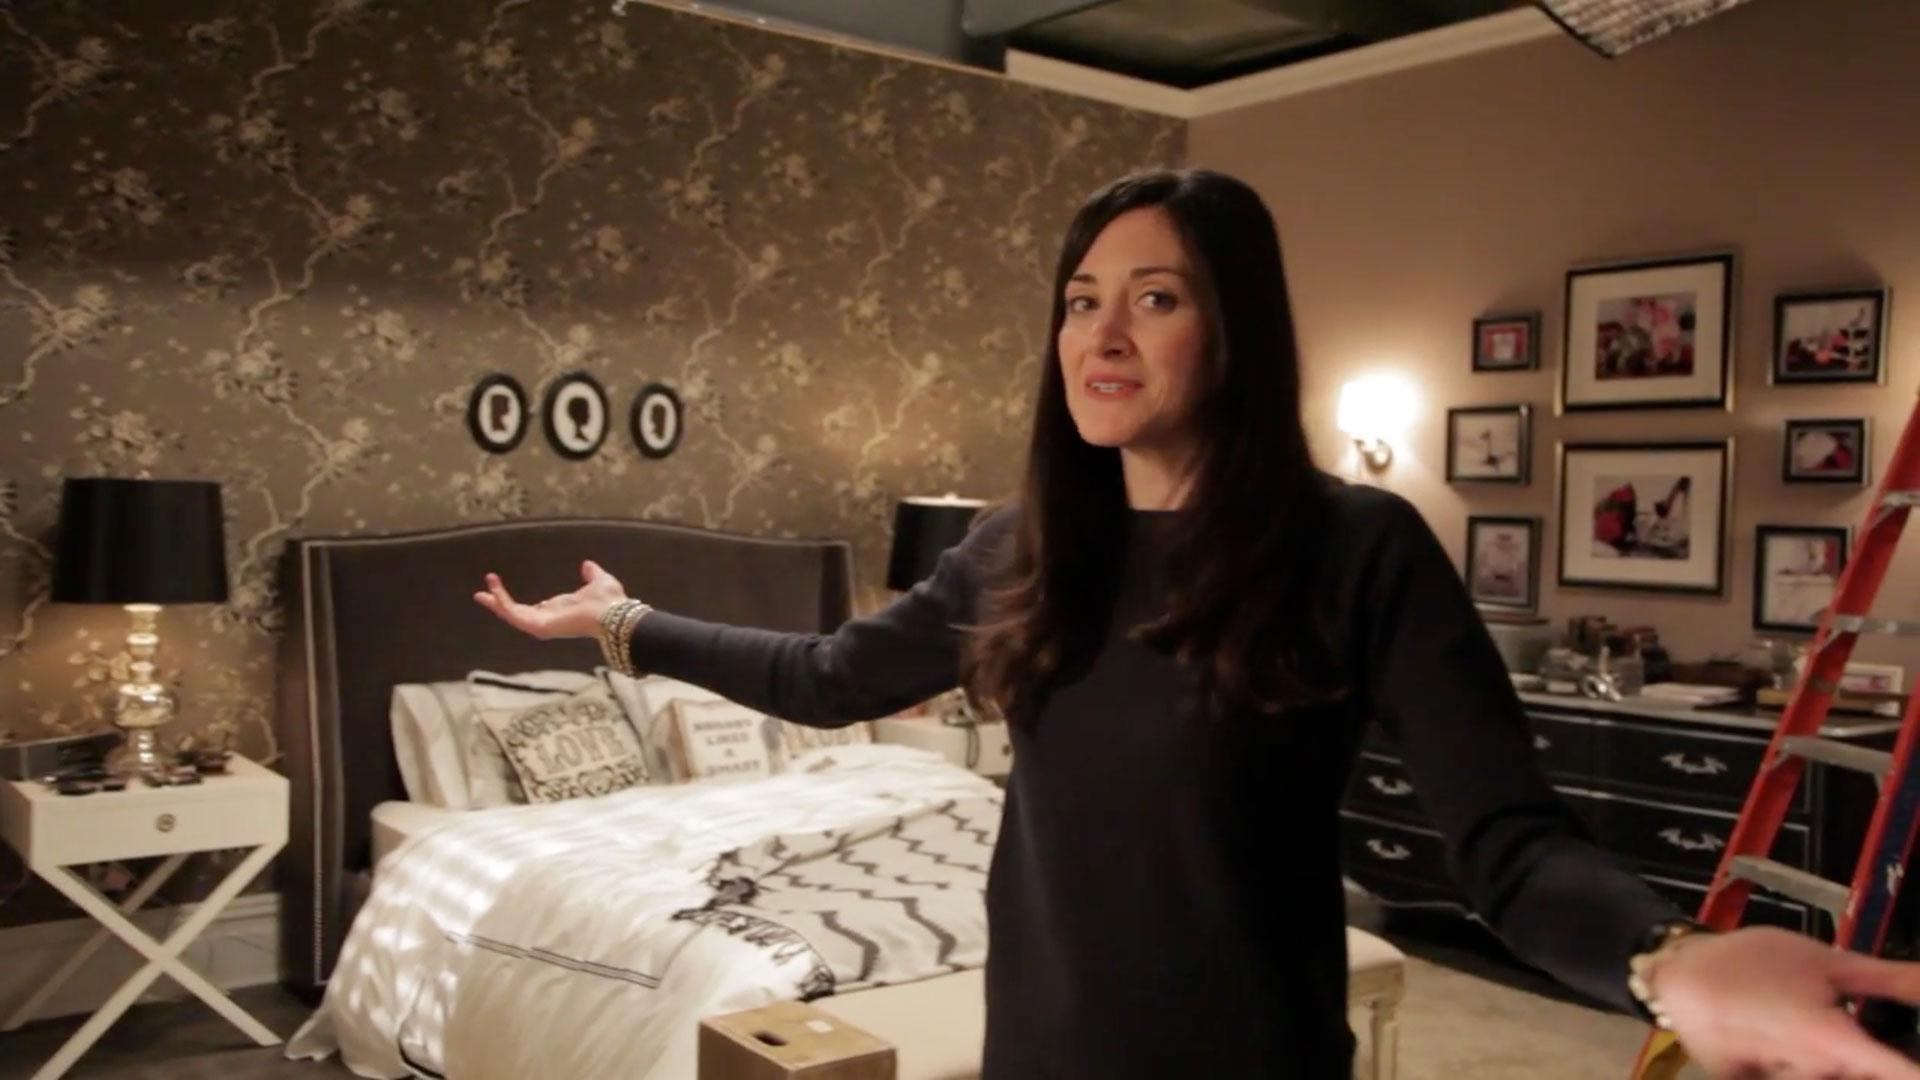 Hot mom in bedroom